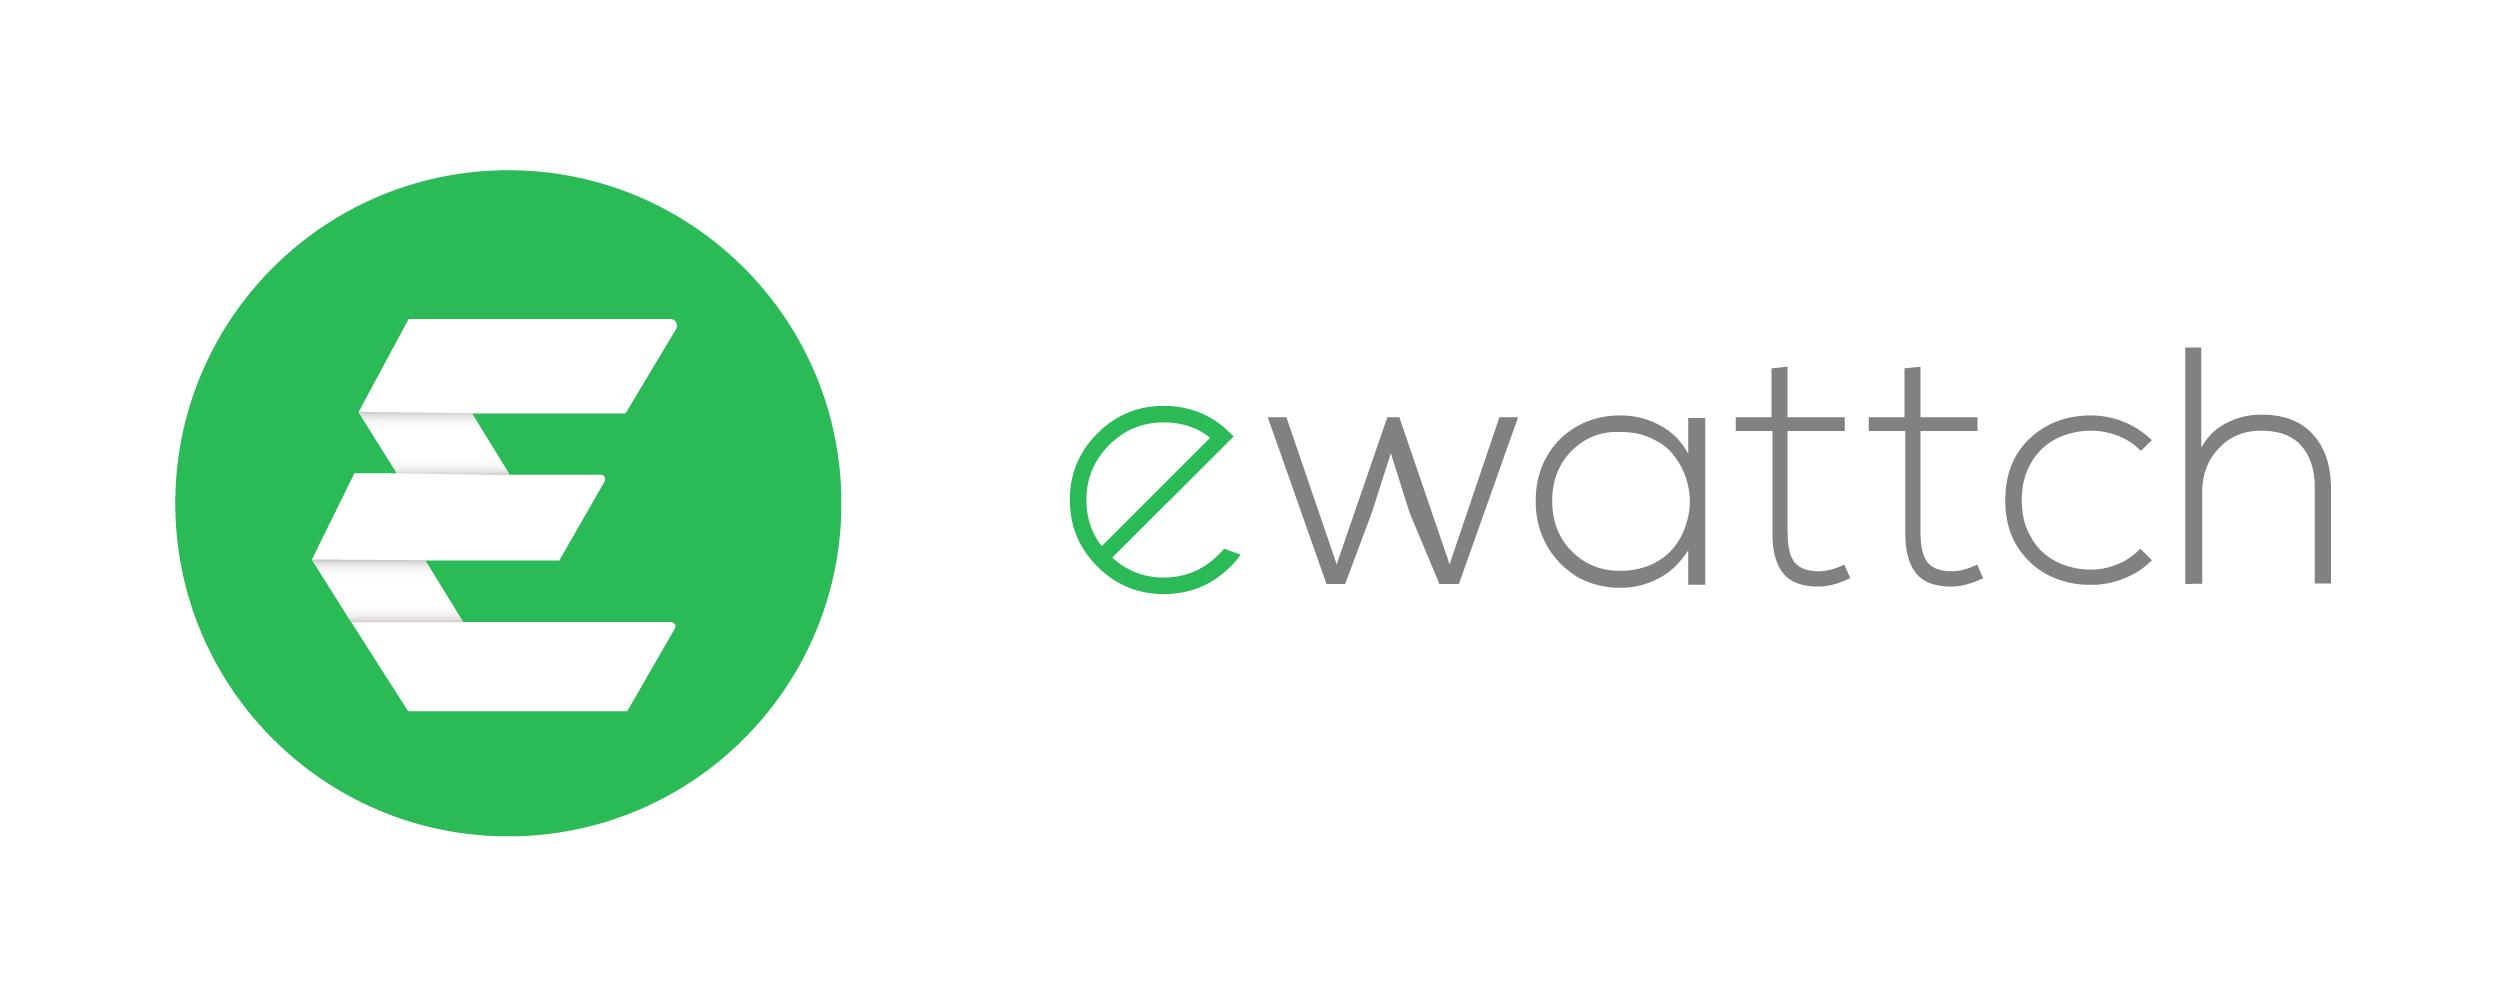 Ewattch